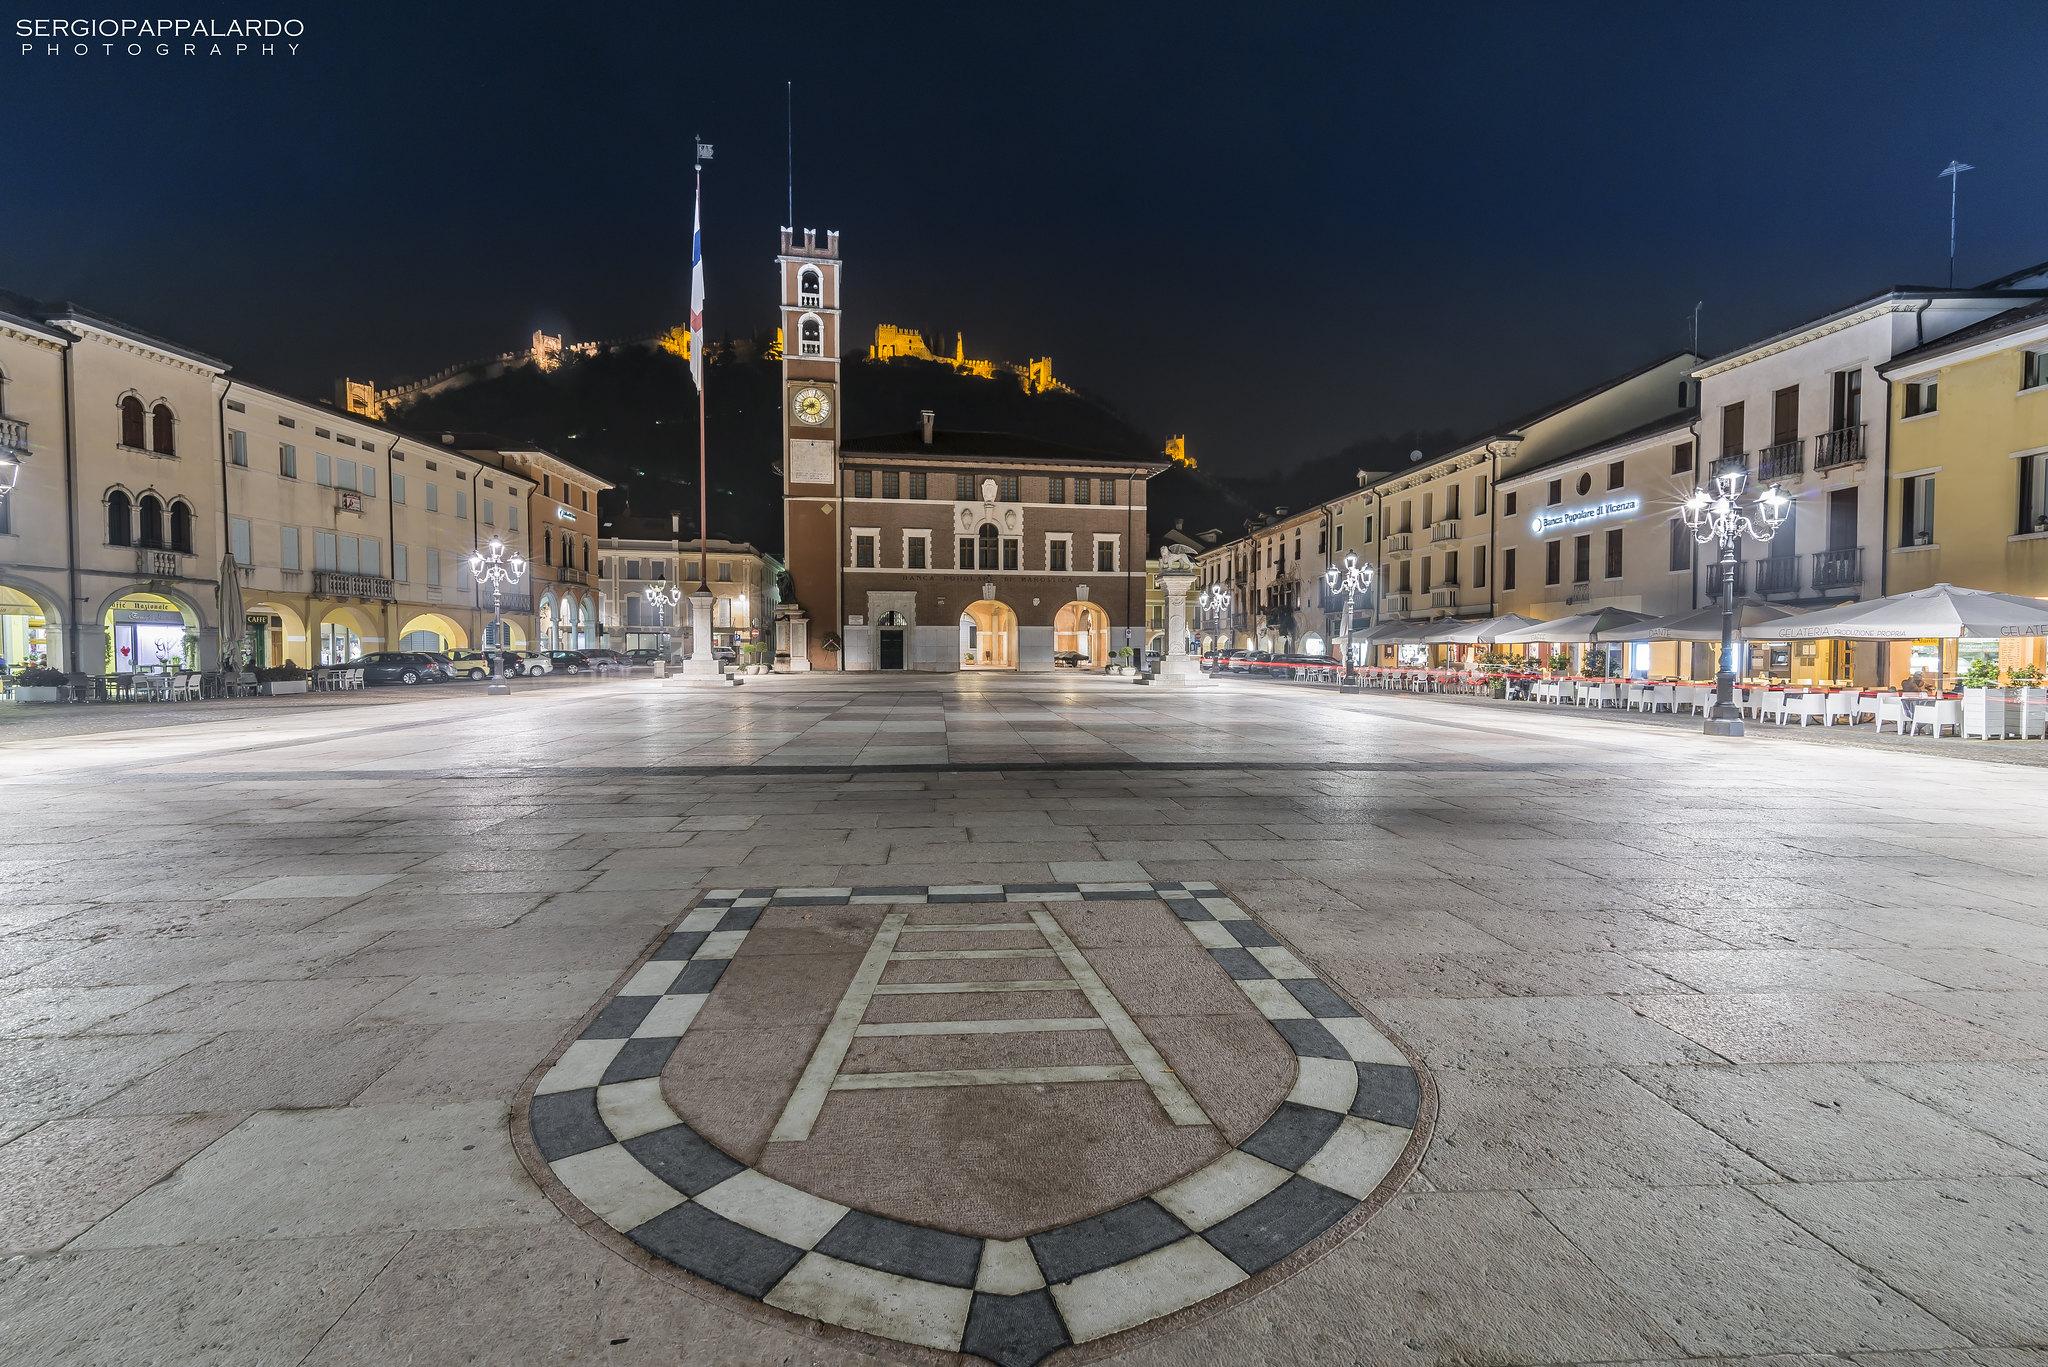 Marostica, Piazza degli Scacchi 35722192880_5967a9b8f6_k